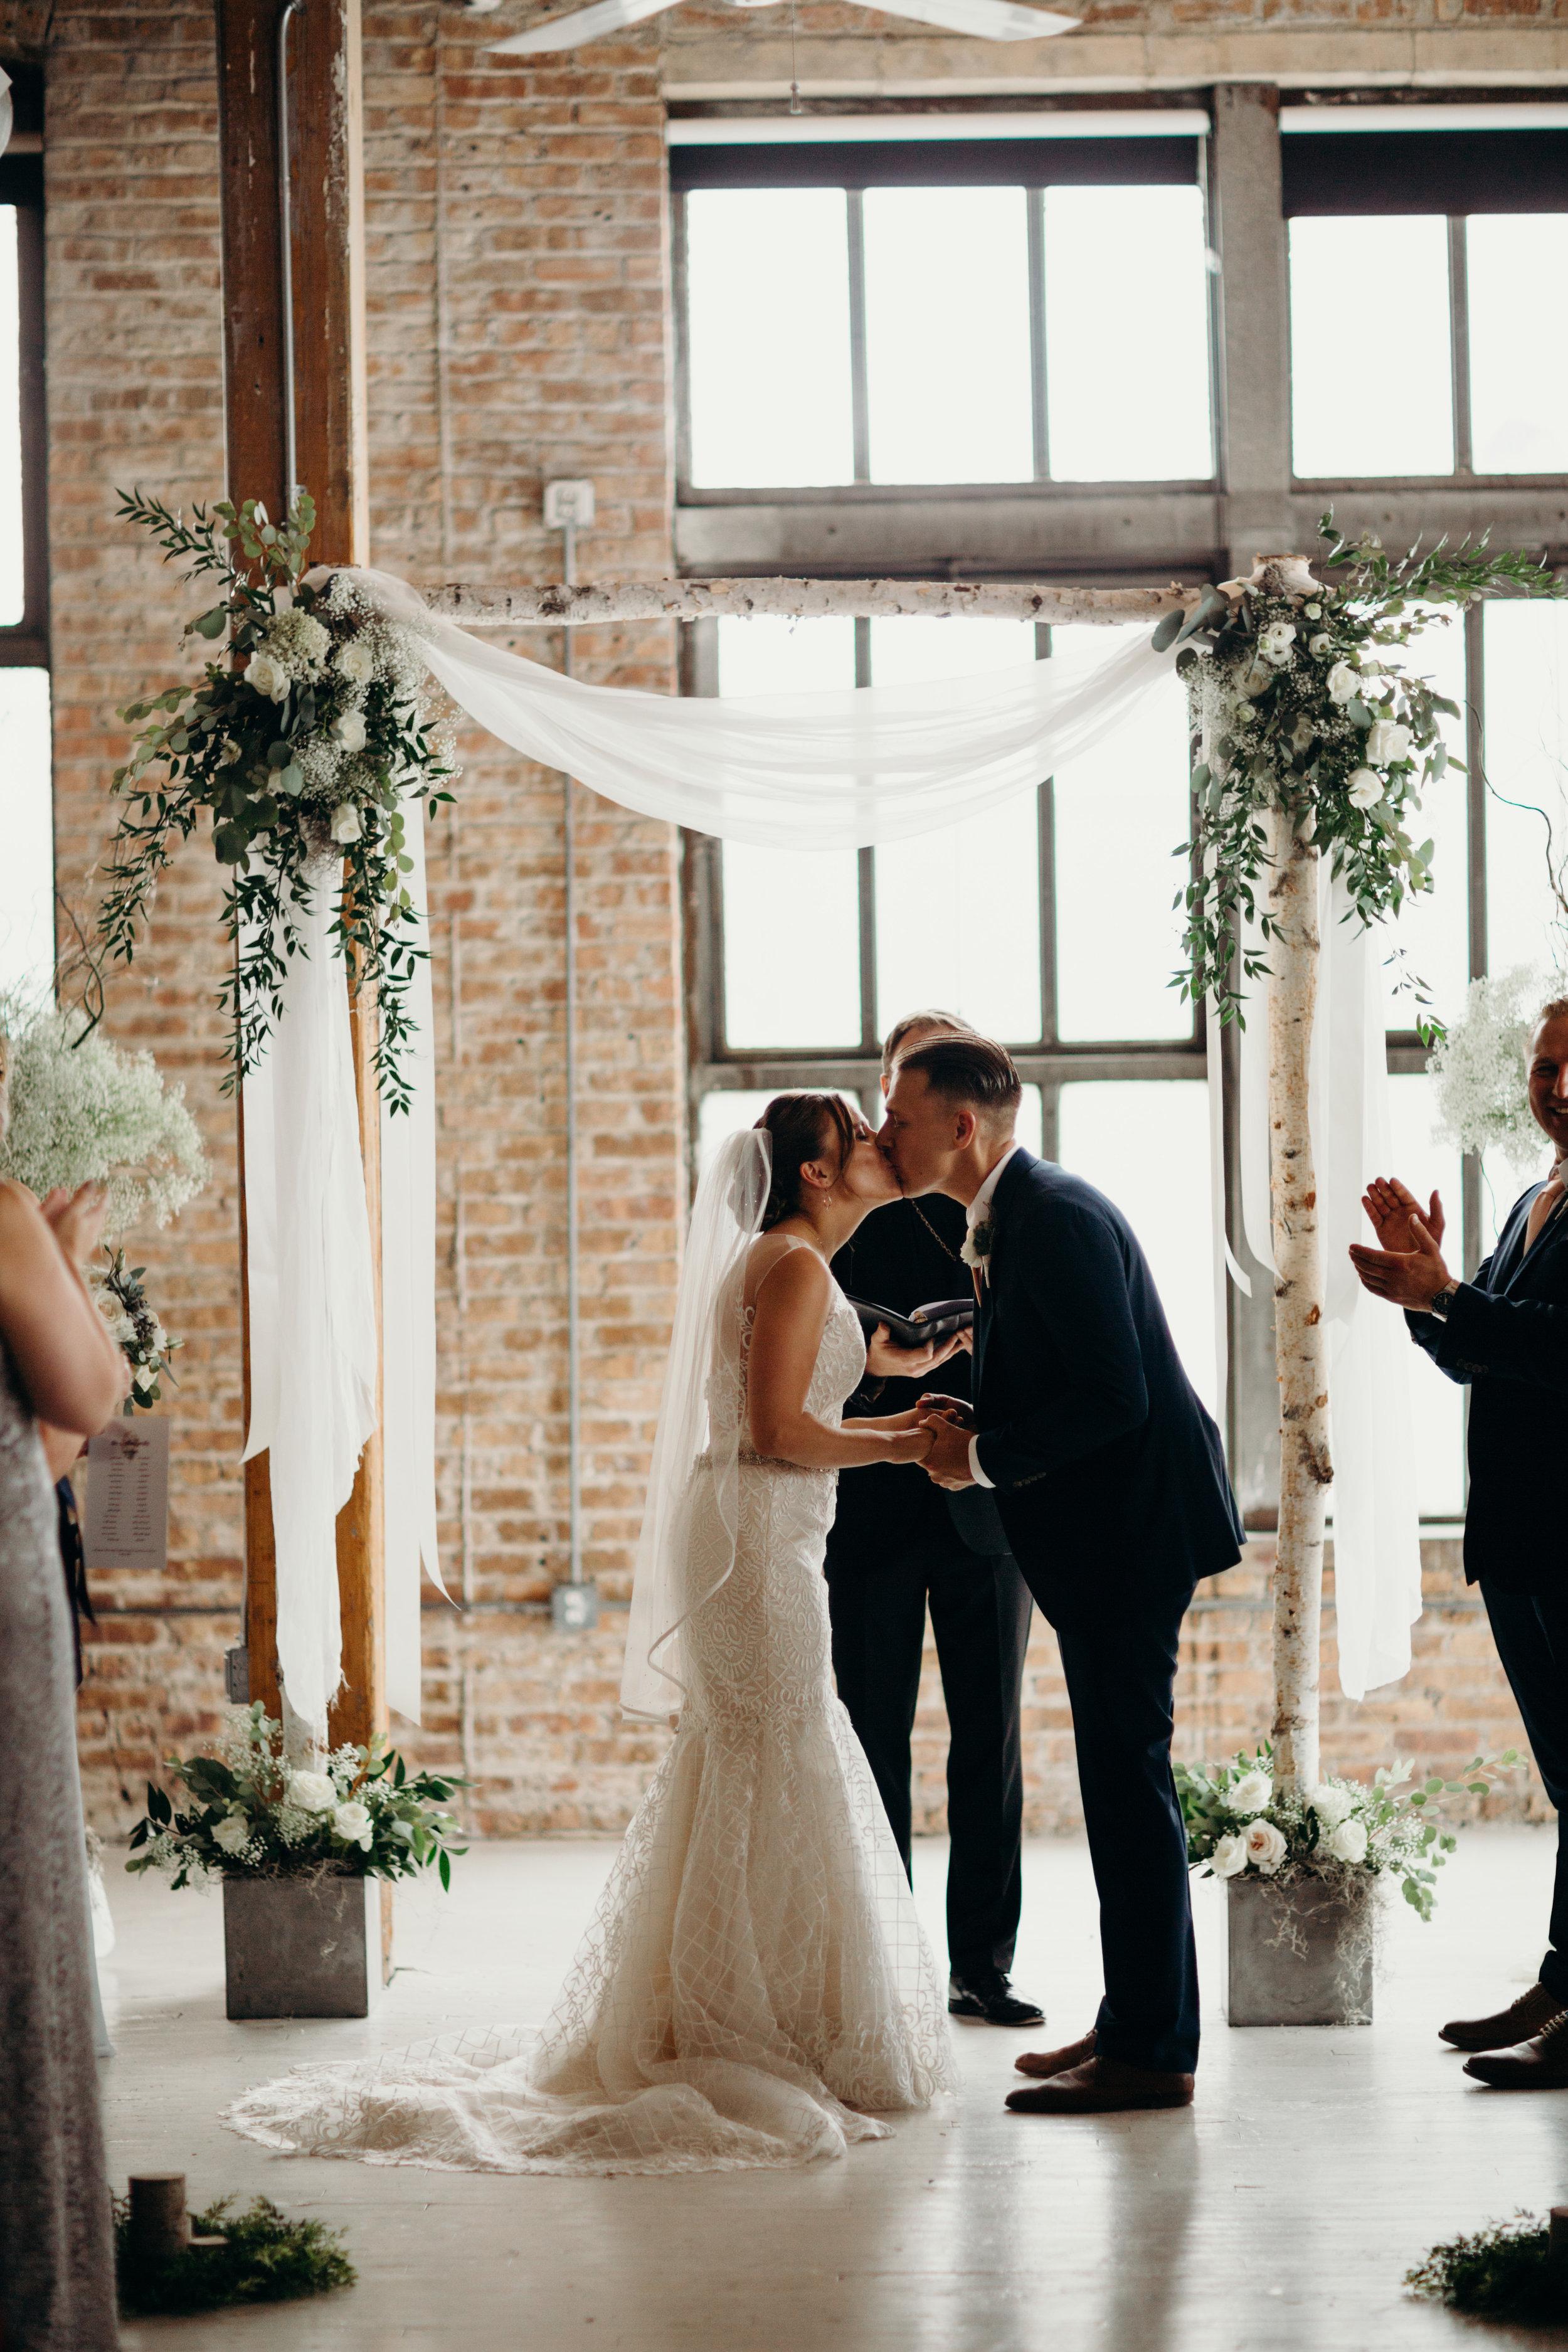 Vintage Wedding_Polly C Photography_20171726172052.jpg